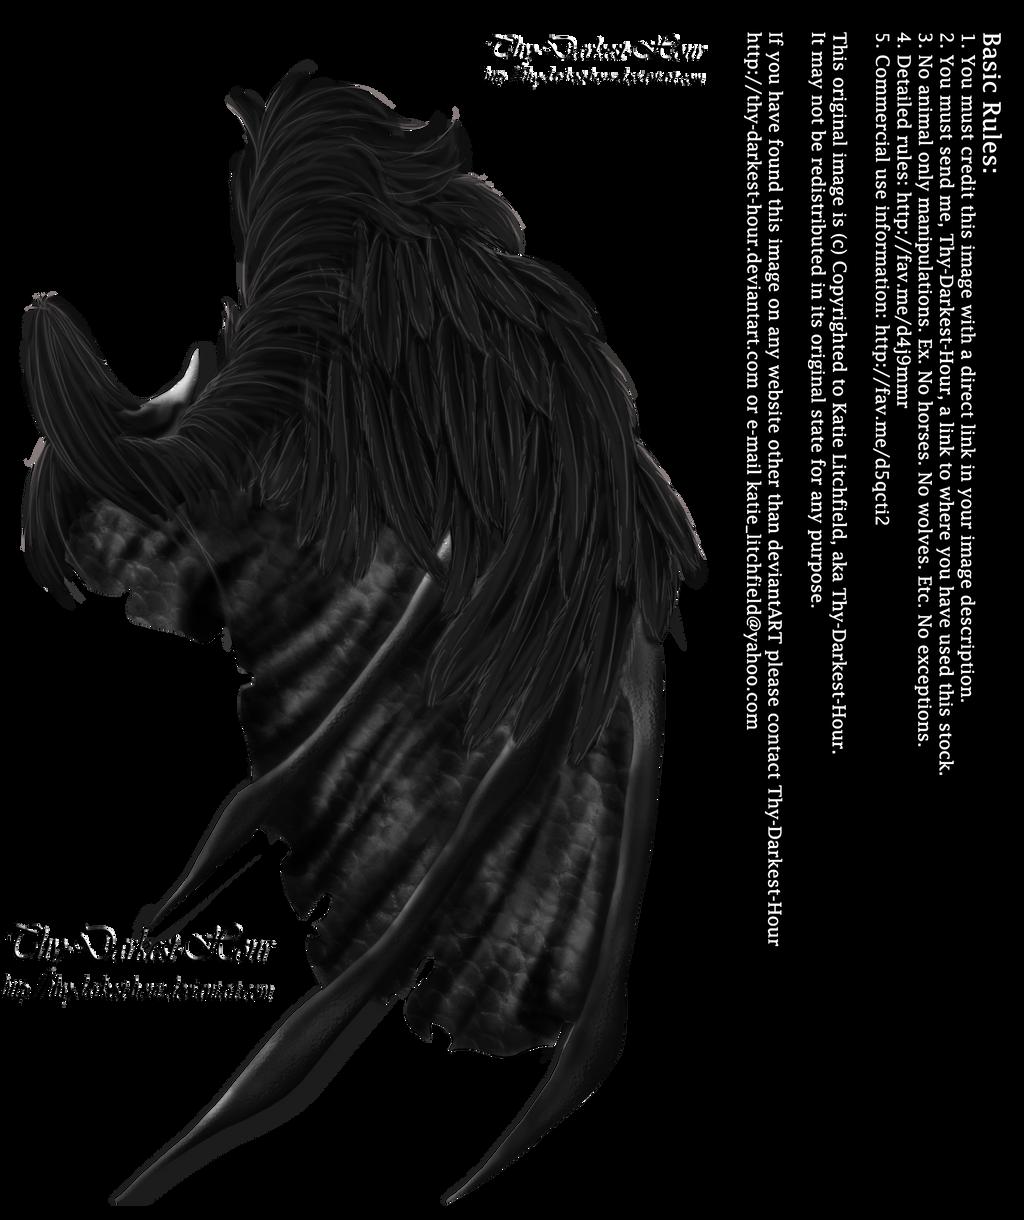 Feathered Demon Wings 02 By Thy Darkest Hour On Deviantart